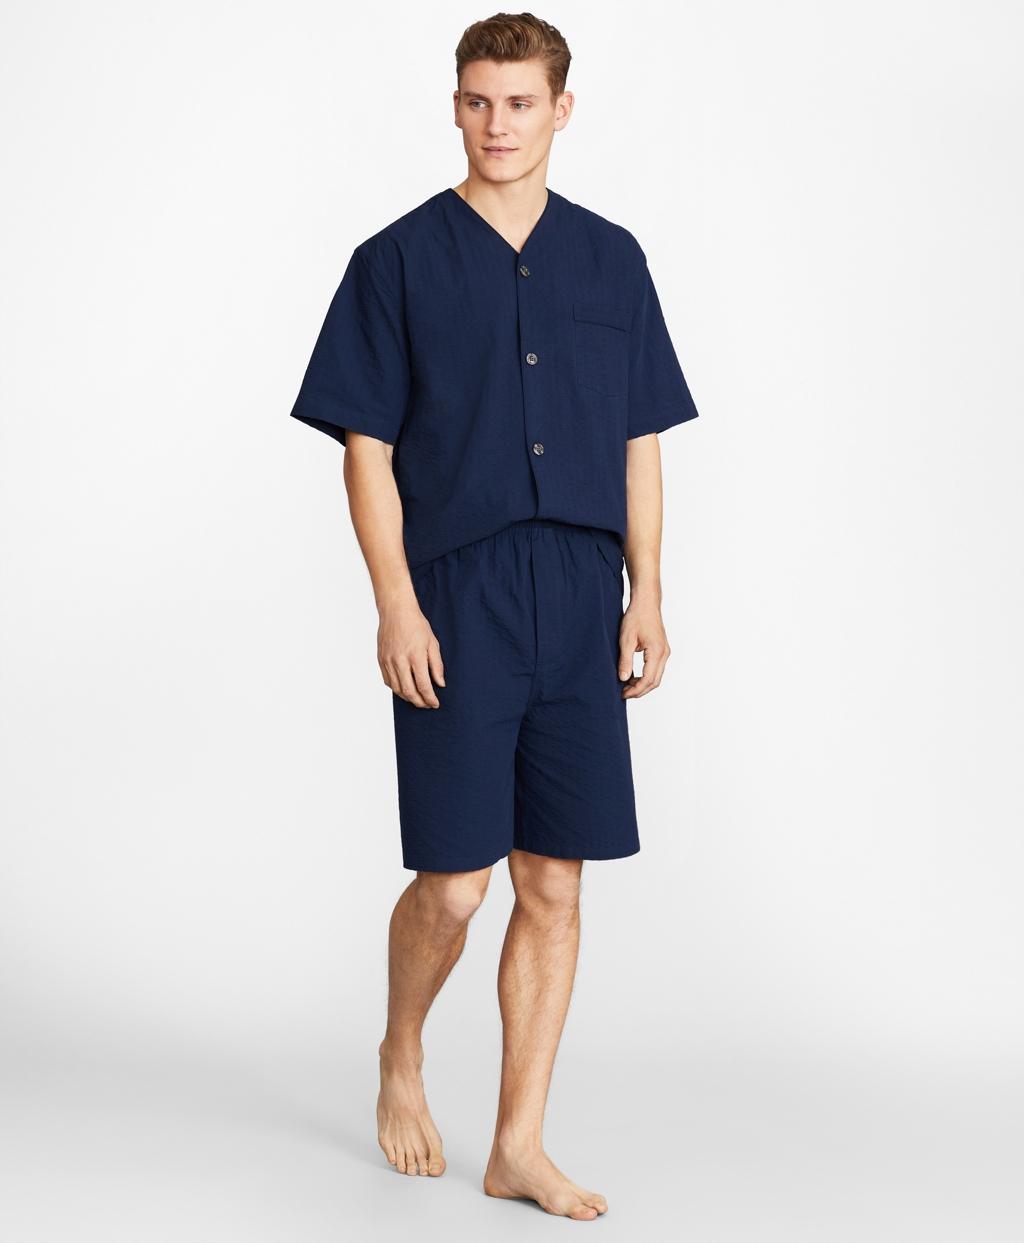 Vintage Men's Underwear Brooks Brothers Mens Seersucker Tonal Stripe Short Pajamas $79.50 AT vintagedancer.com